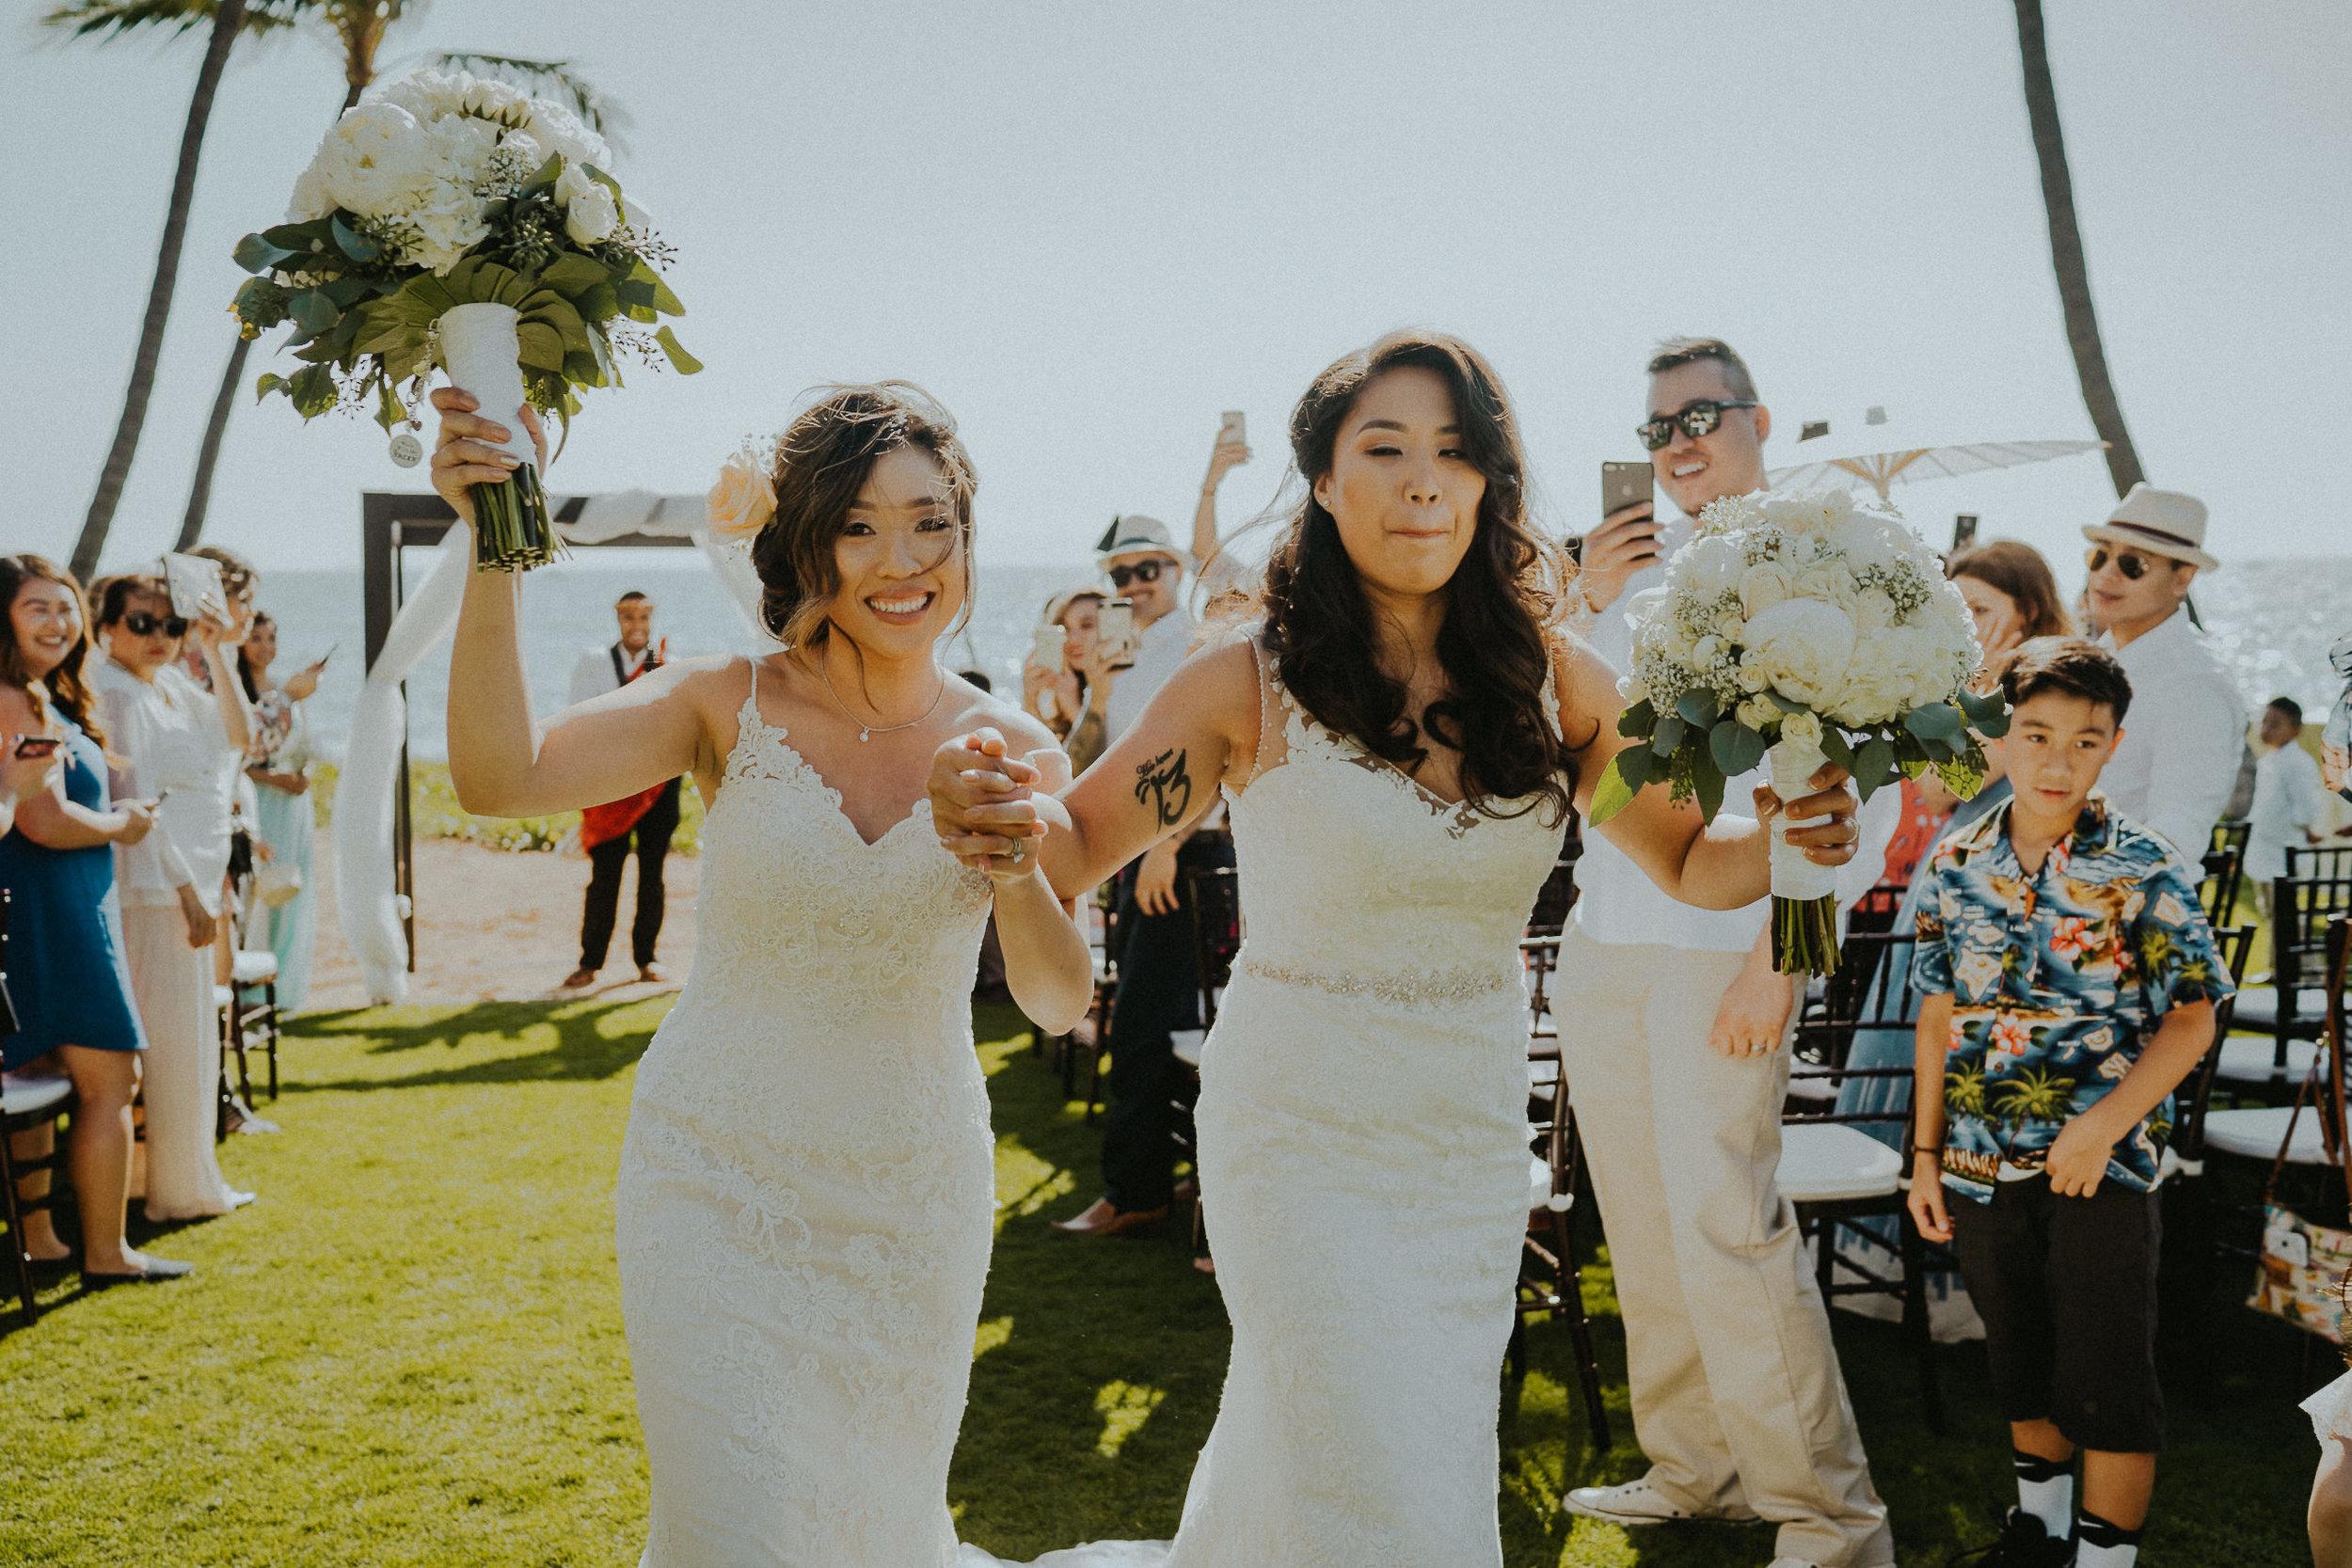 Maui_Destination_wedding_Alfred_Tang-26.jpg